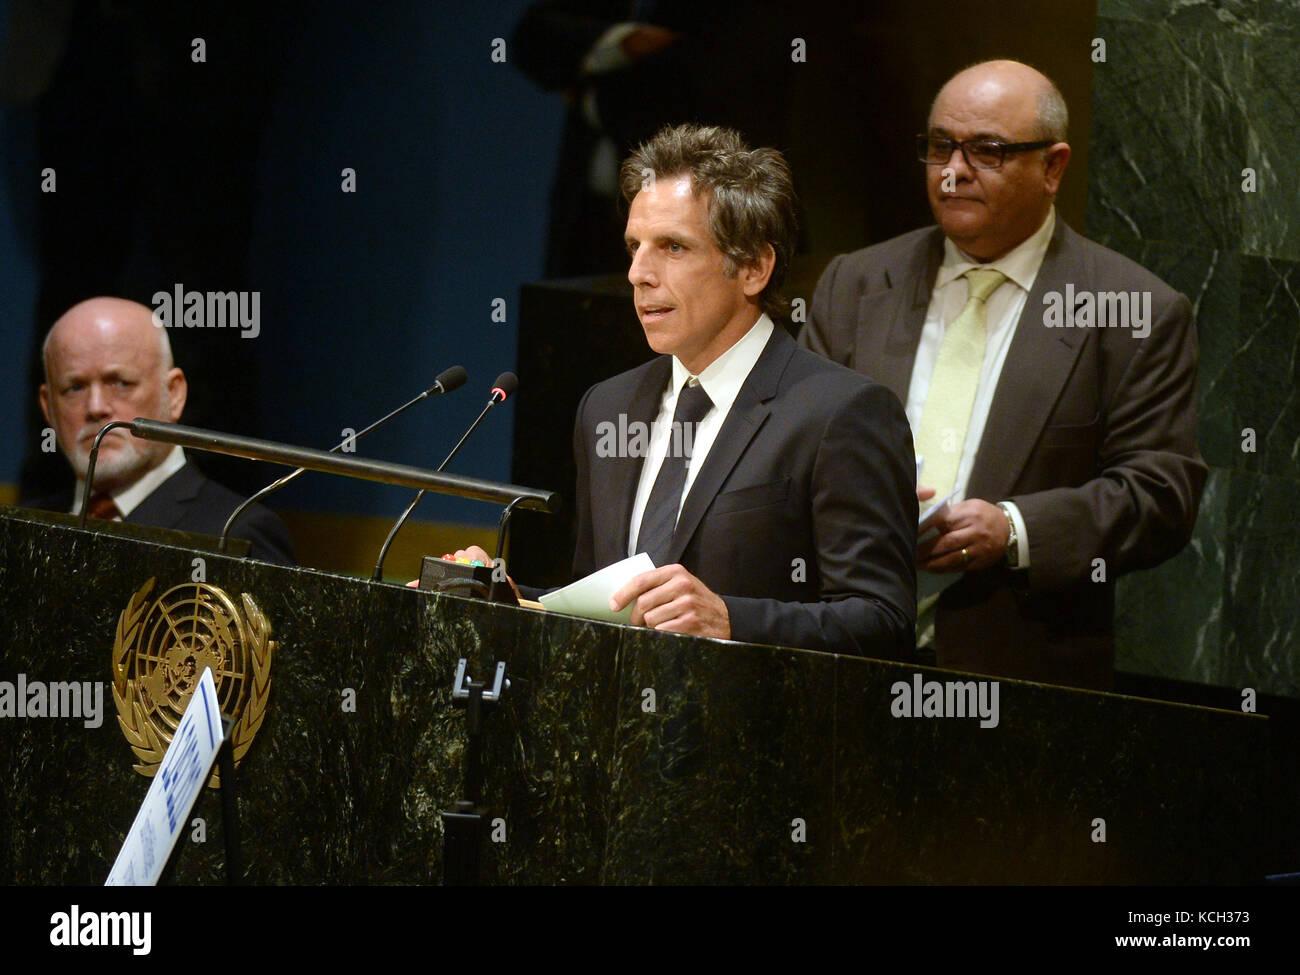 NEW YORK, NY - SEPTEMBER 16: UNHCR supporter Ben Stiller speaks during UNHCR #WithRefugees petition handover at Stock Photo